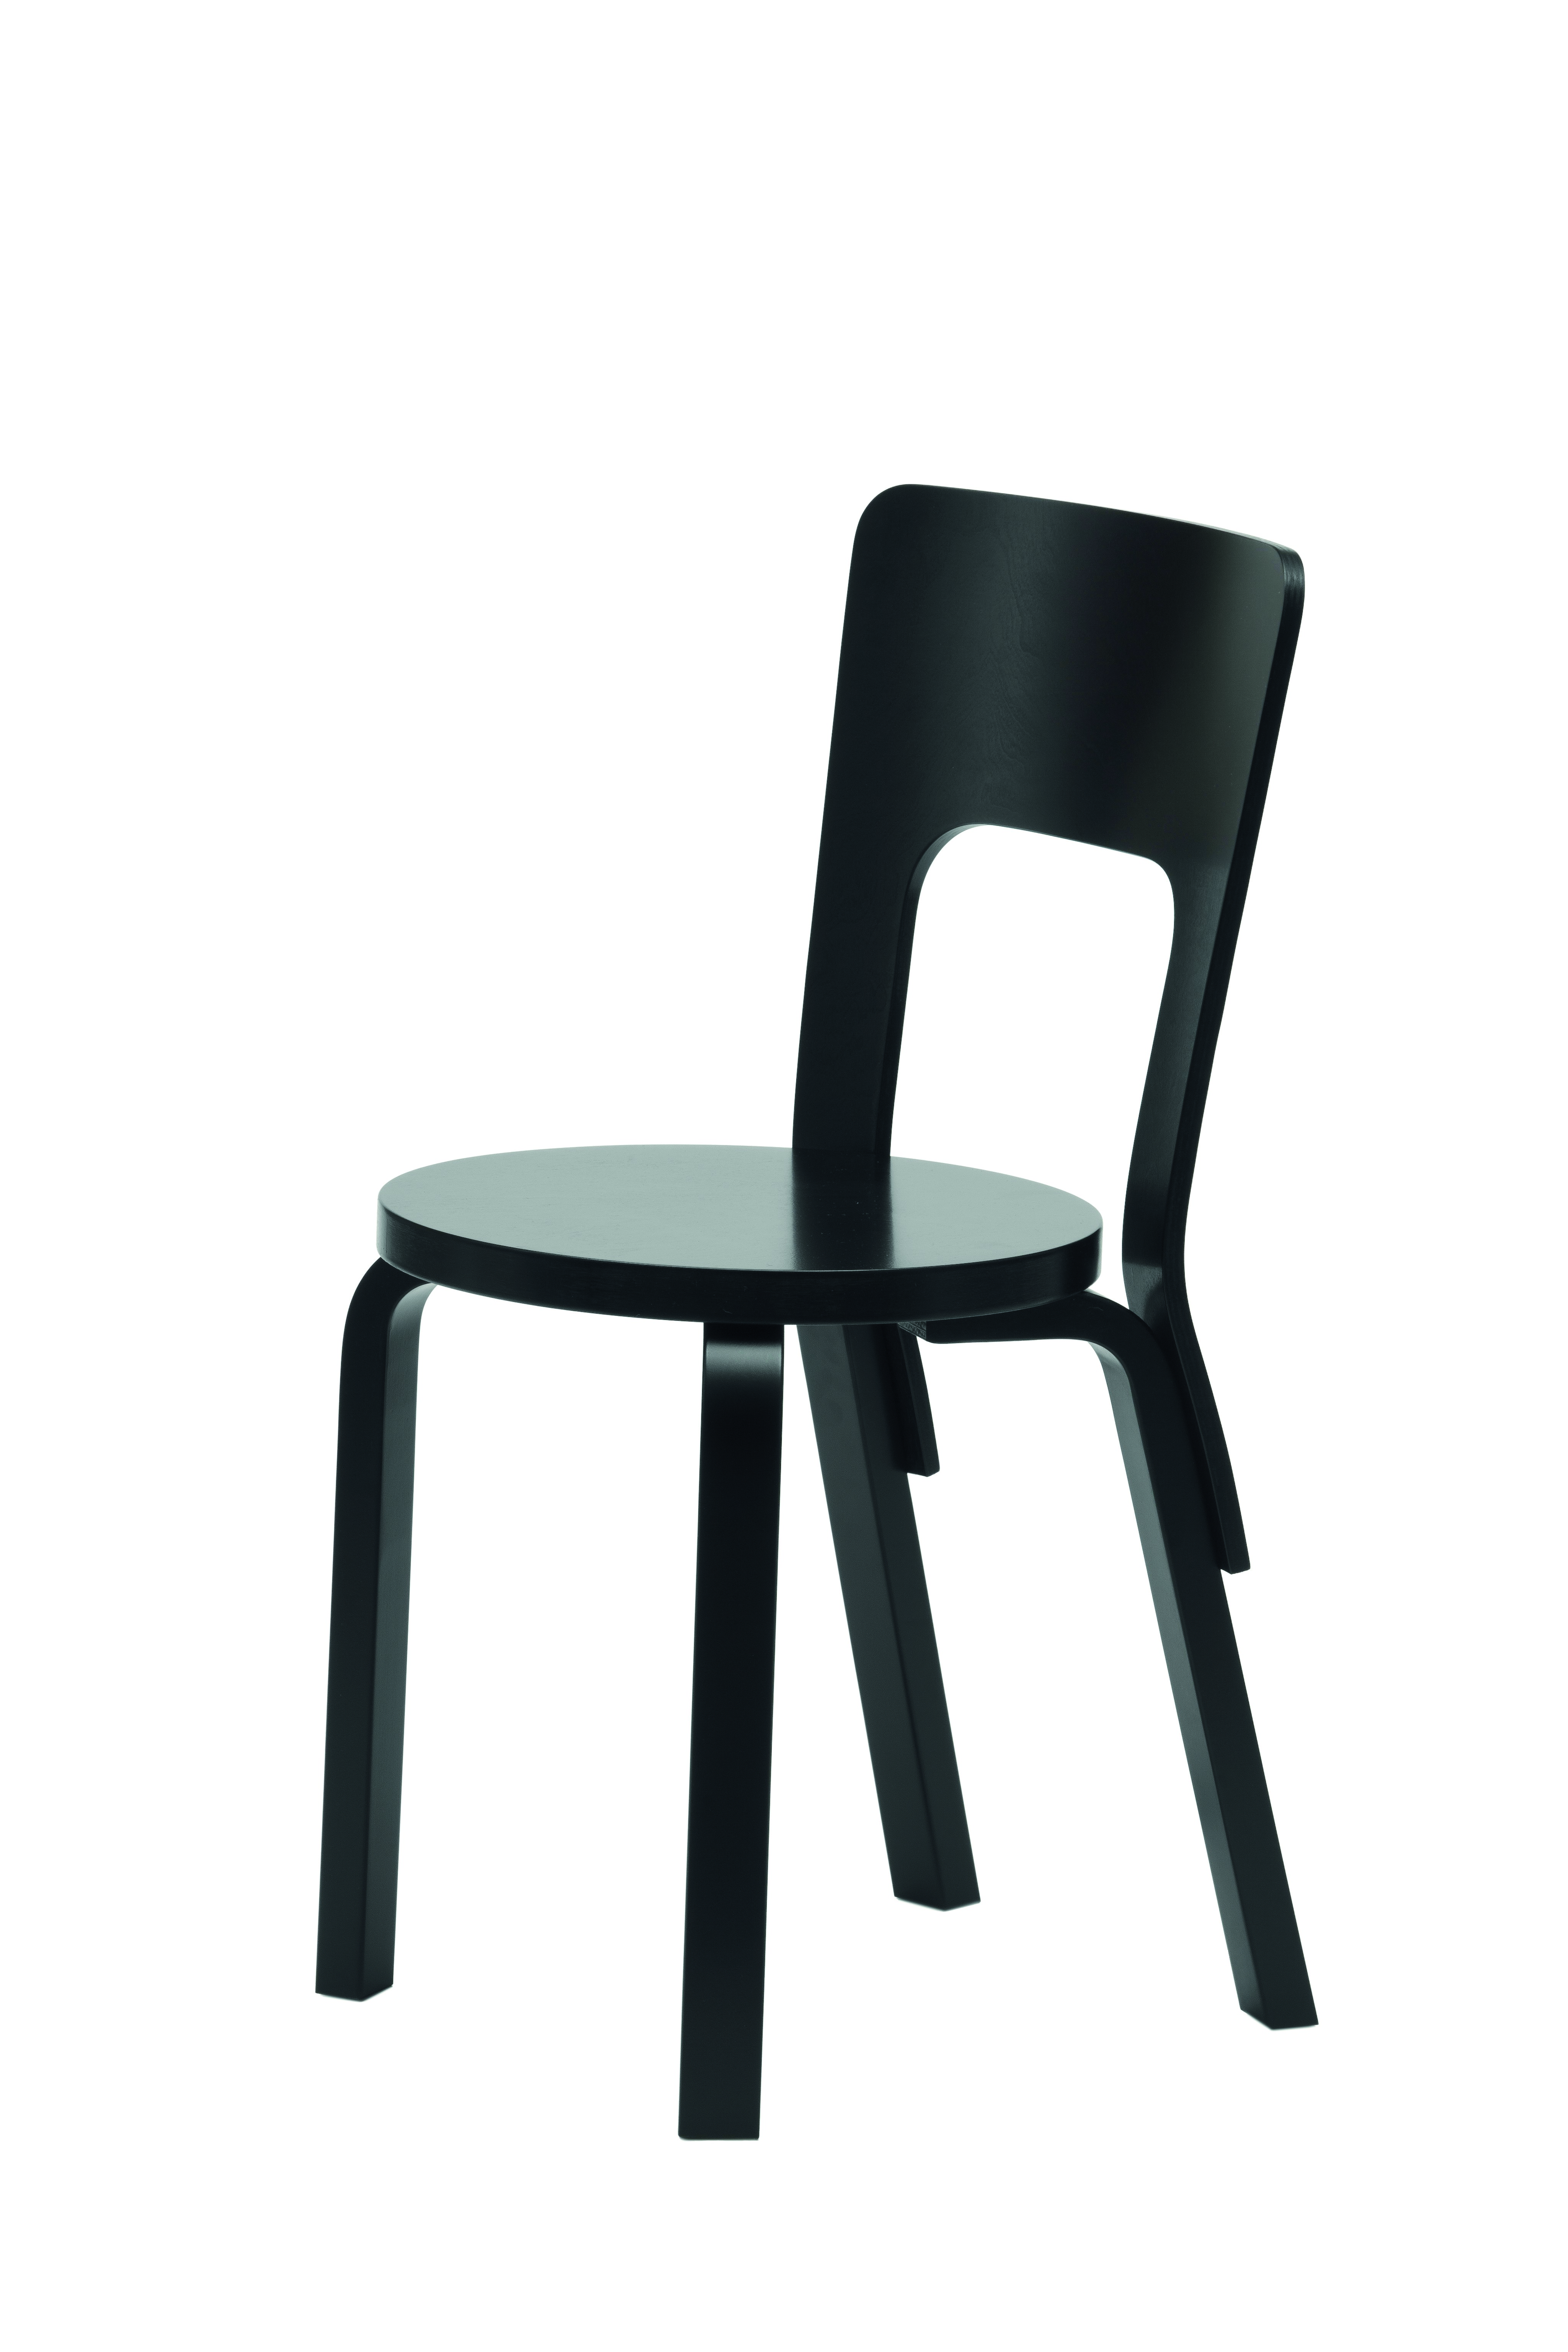 artek chaise 66 design alvar aalto. Black Bedroom Furniture Sets. Home Design Ideas